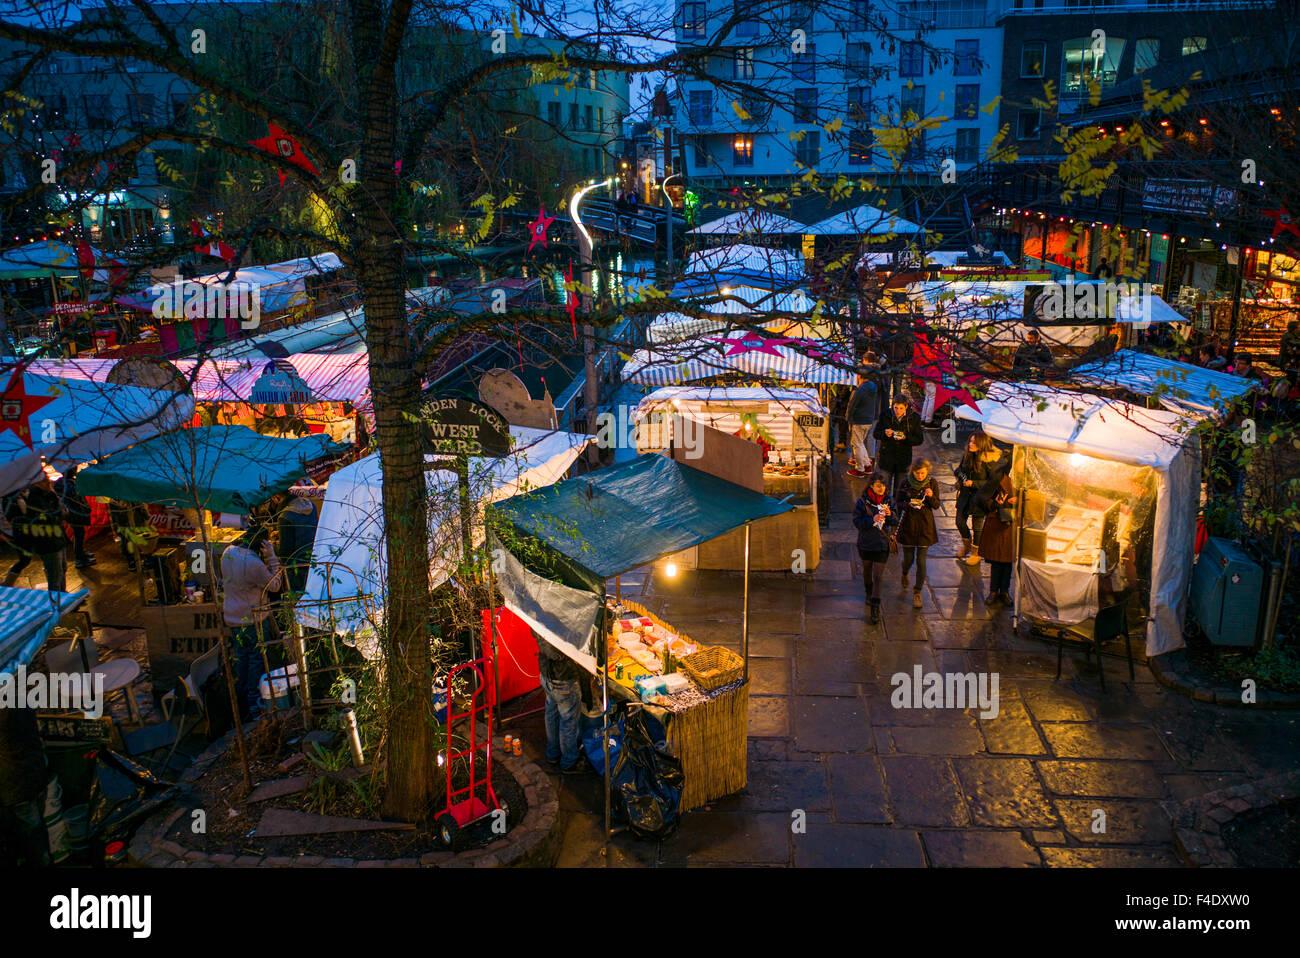 England london camden market outdoor food court dusk for Outdoor food market